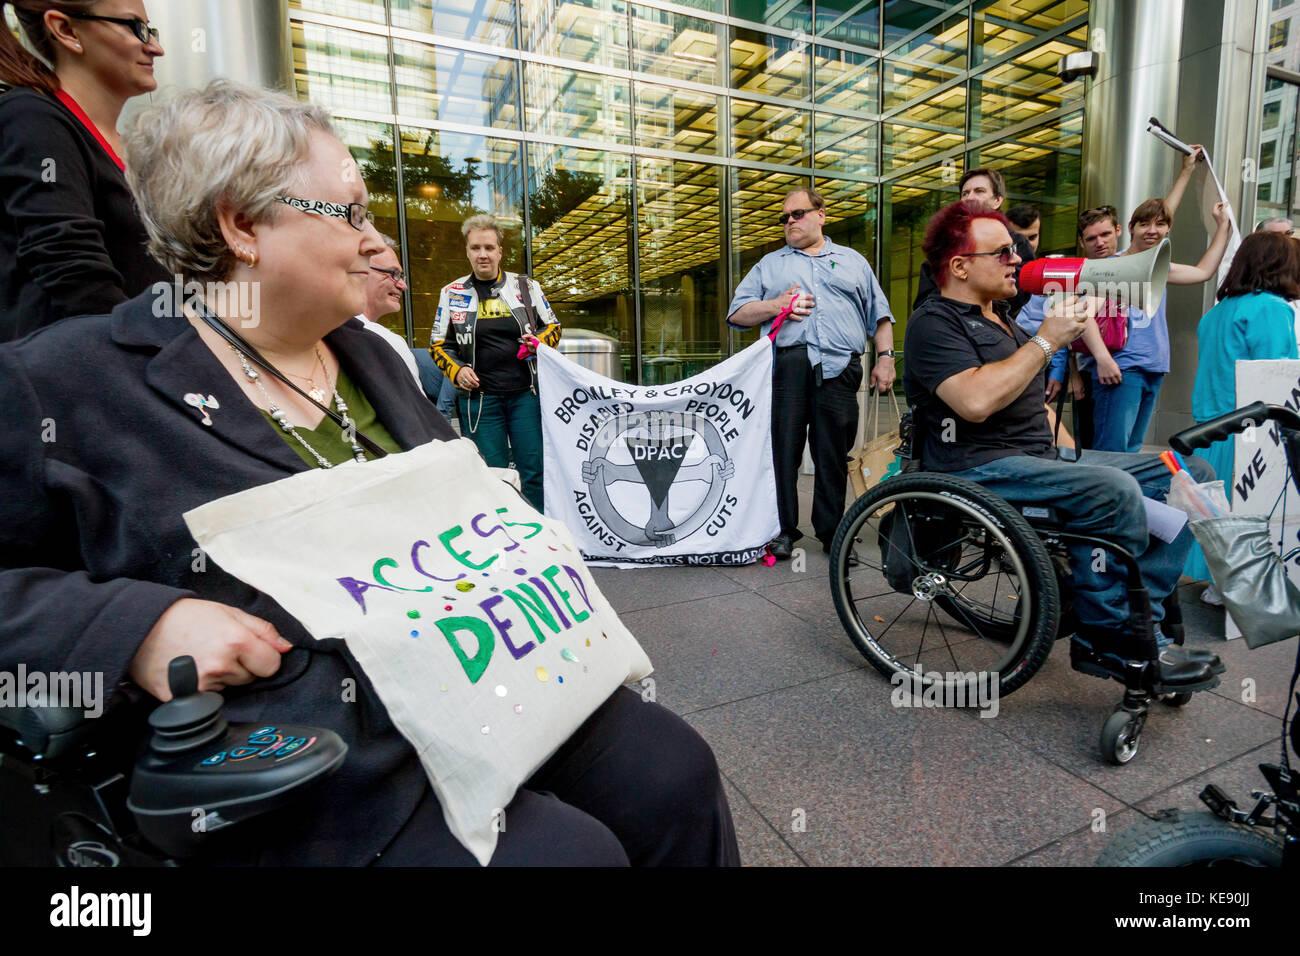 Disability im genes de stock disability fotos de stock for Fuera de oficina gmail